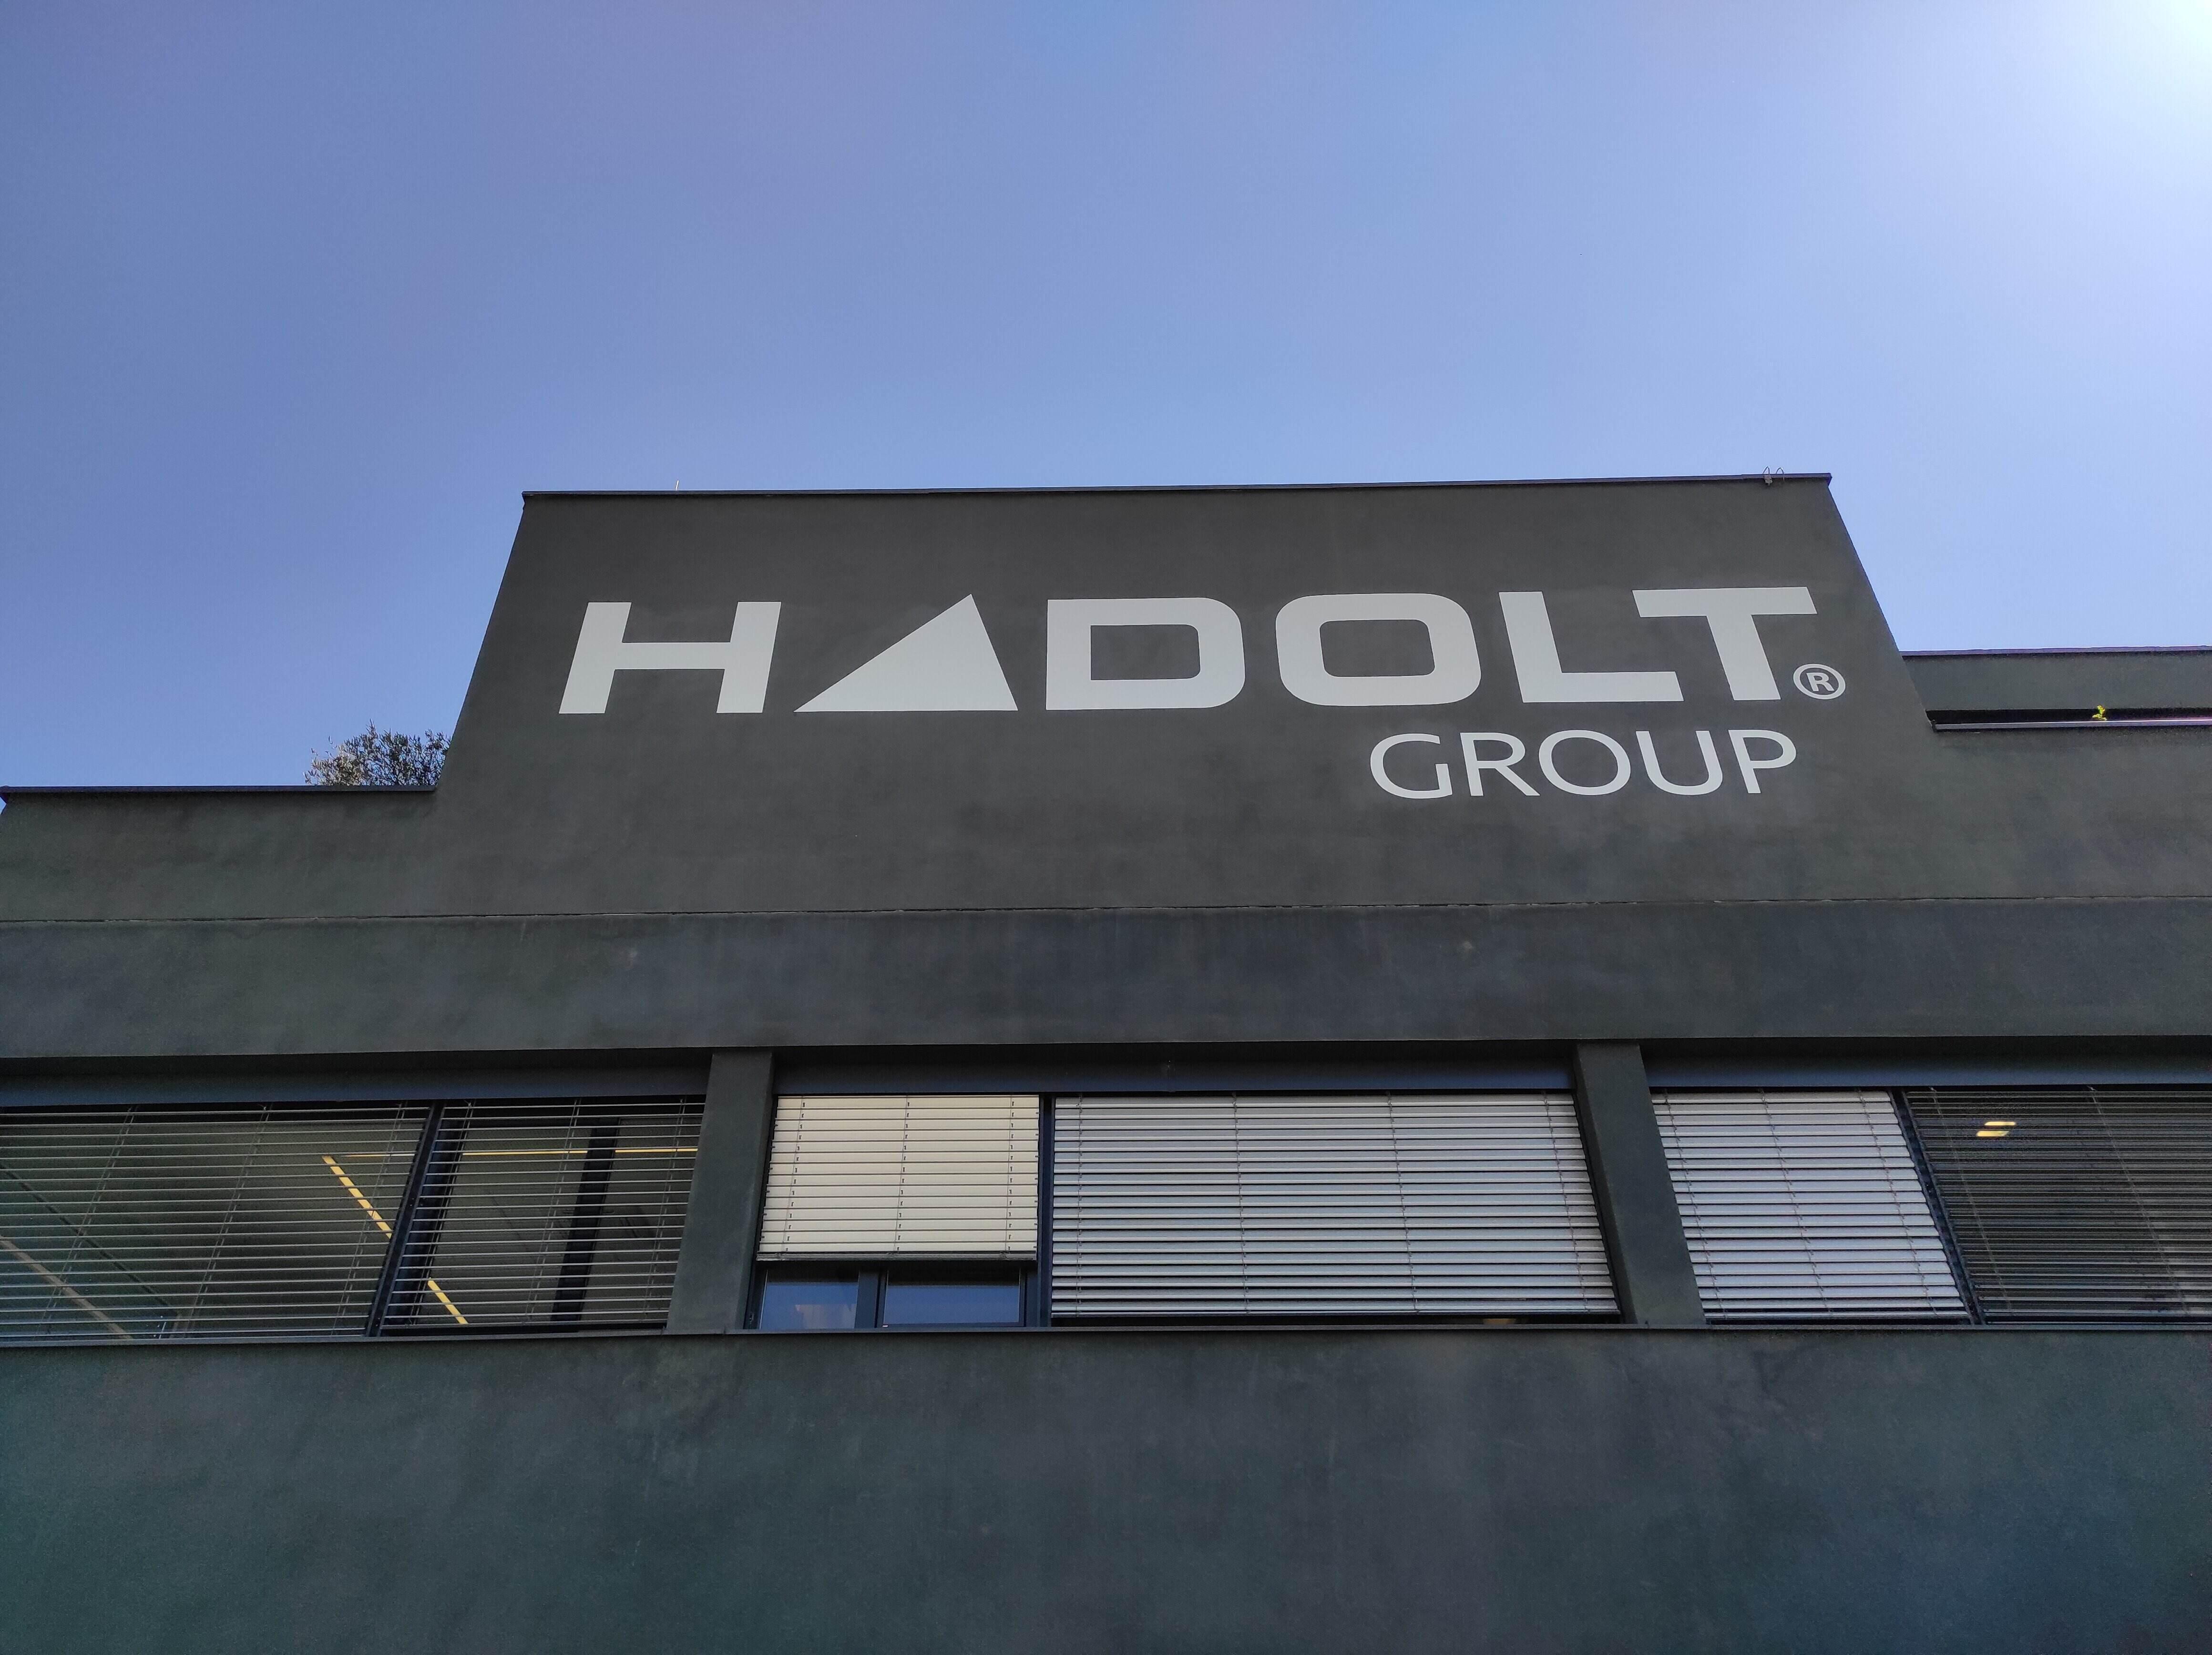 Hadolt service ostalo